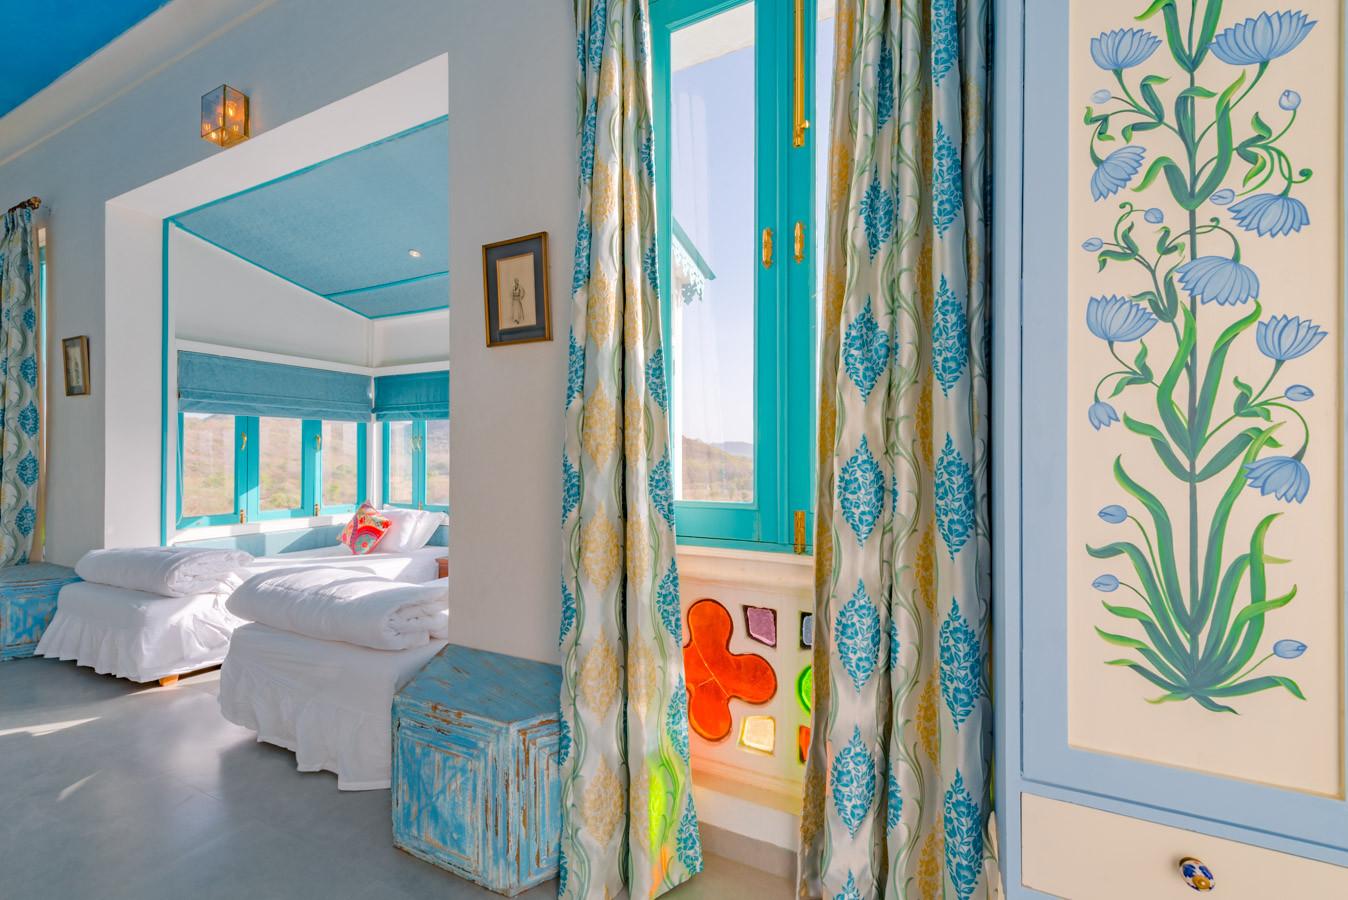 Room-6_Unbound_Jungalow_8.jpg